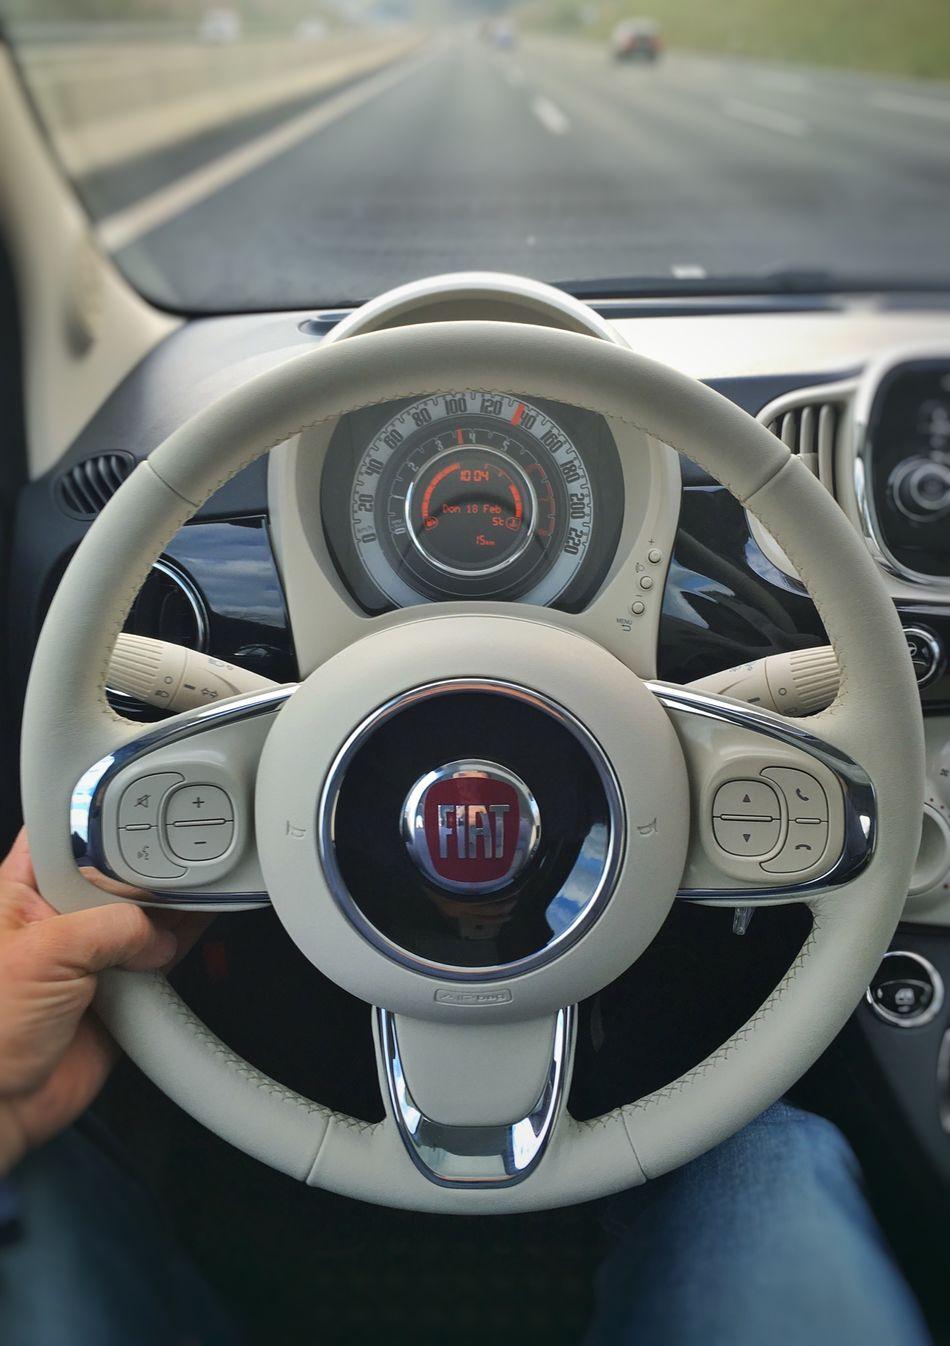 …in this fancy *brand new* #Fiat500 en route to Nürnberg!